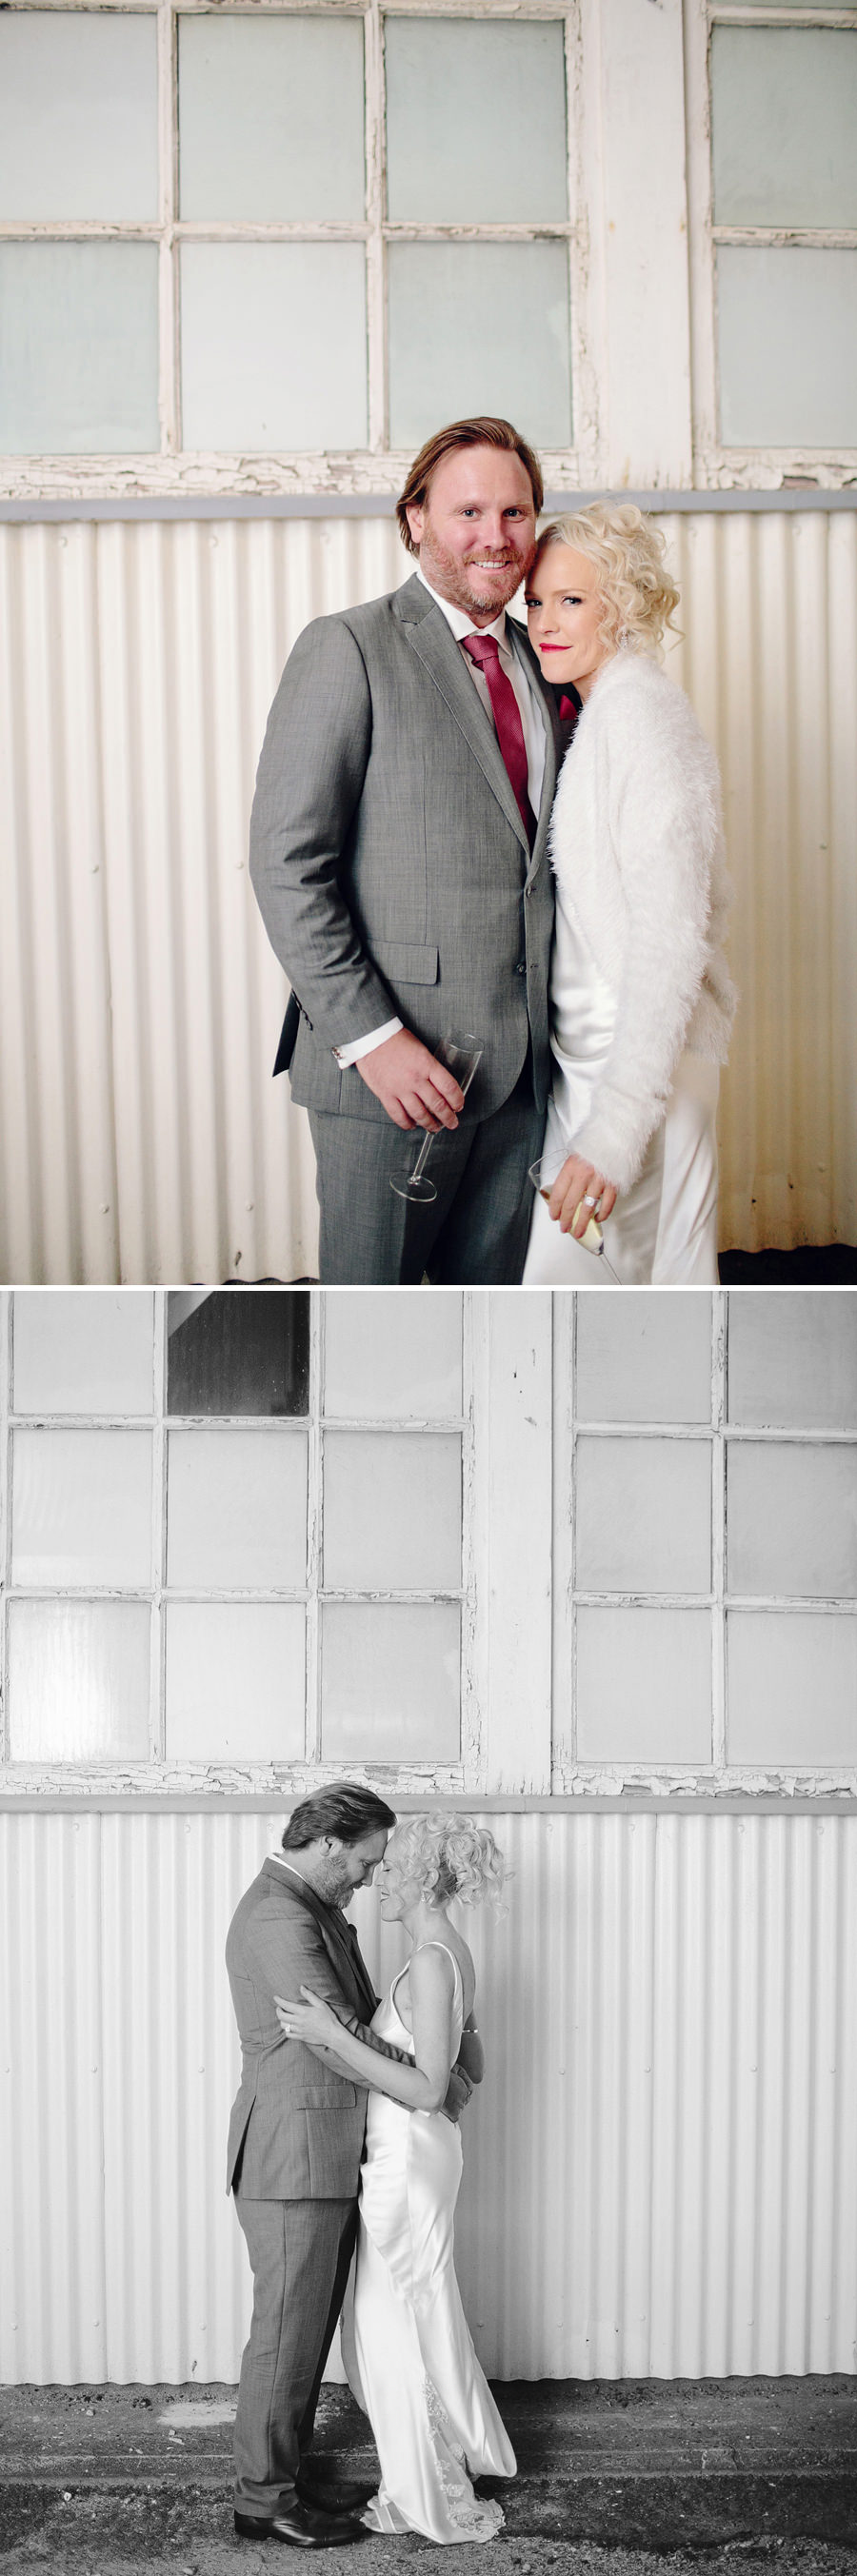 Cockatoo Island Sydney Wedding Photographers: Portraits